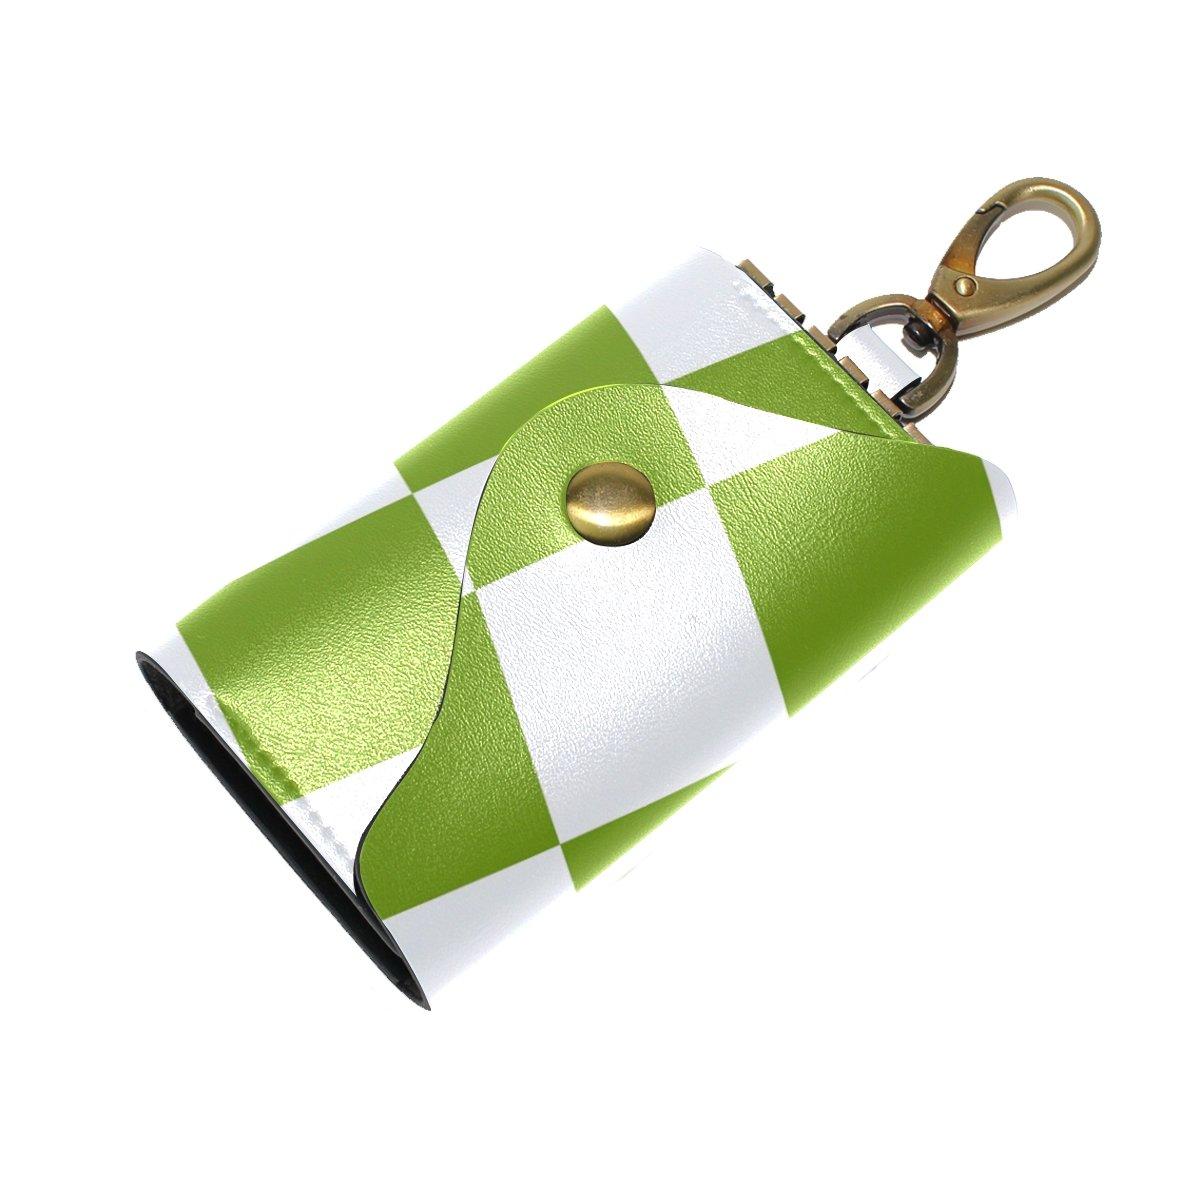 DEYYA White Green Squares Checkered Leather Key Case Wallets Unisex Keychain Key Holder with 6 Hooks Snap Closure